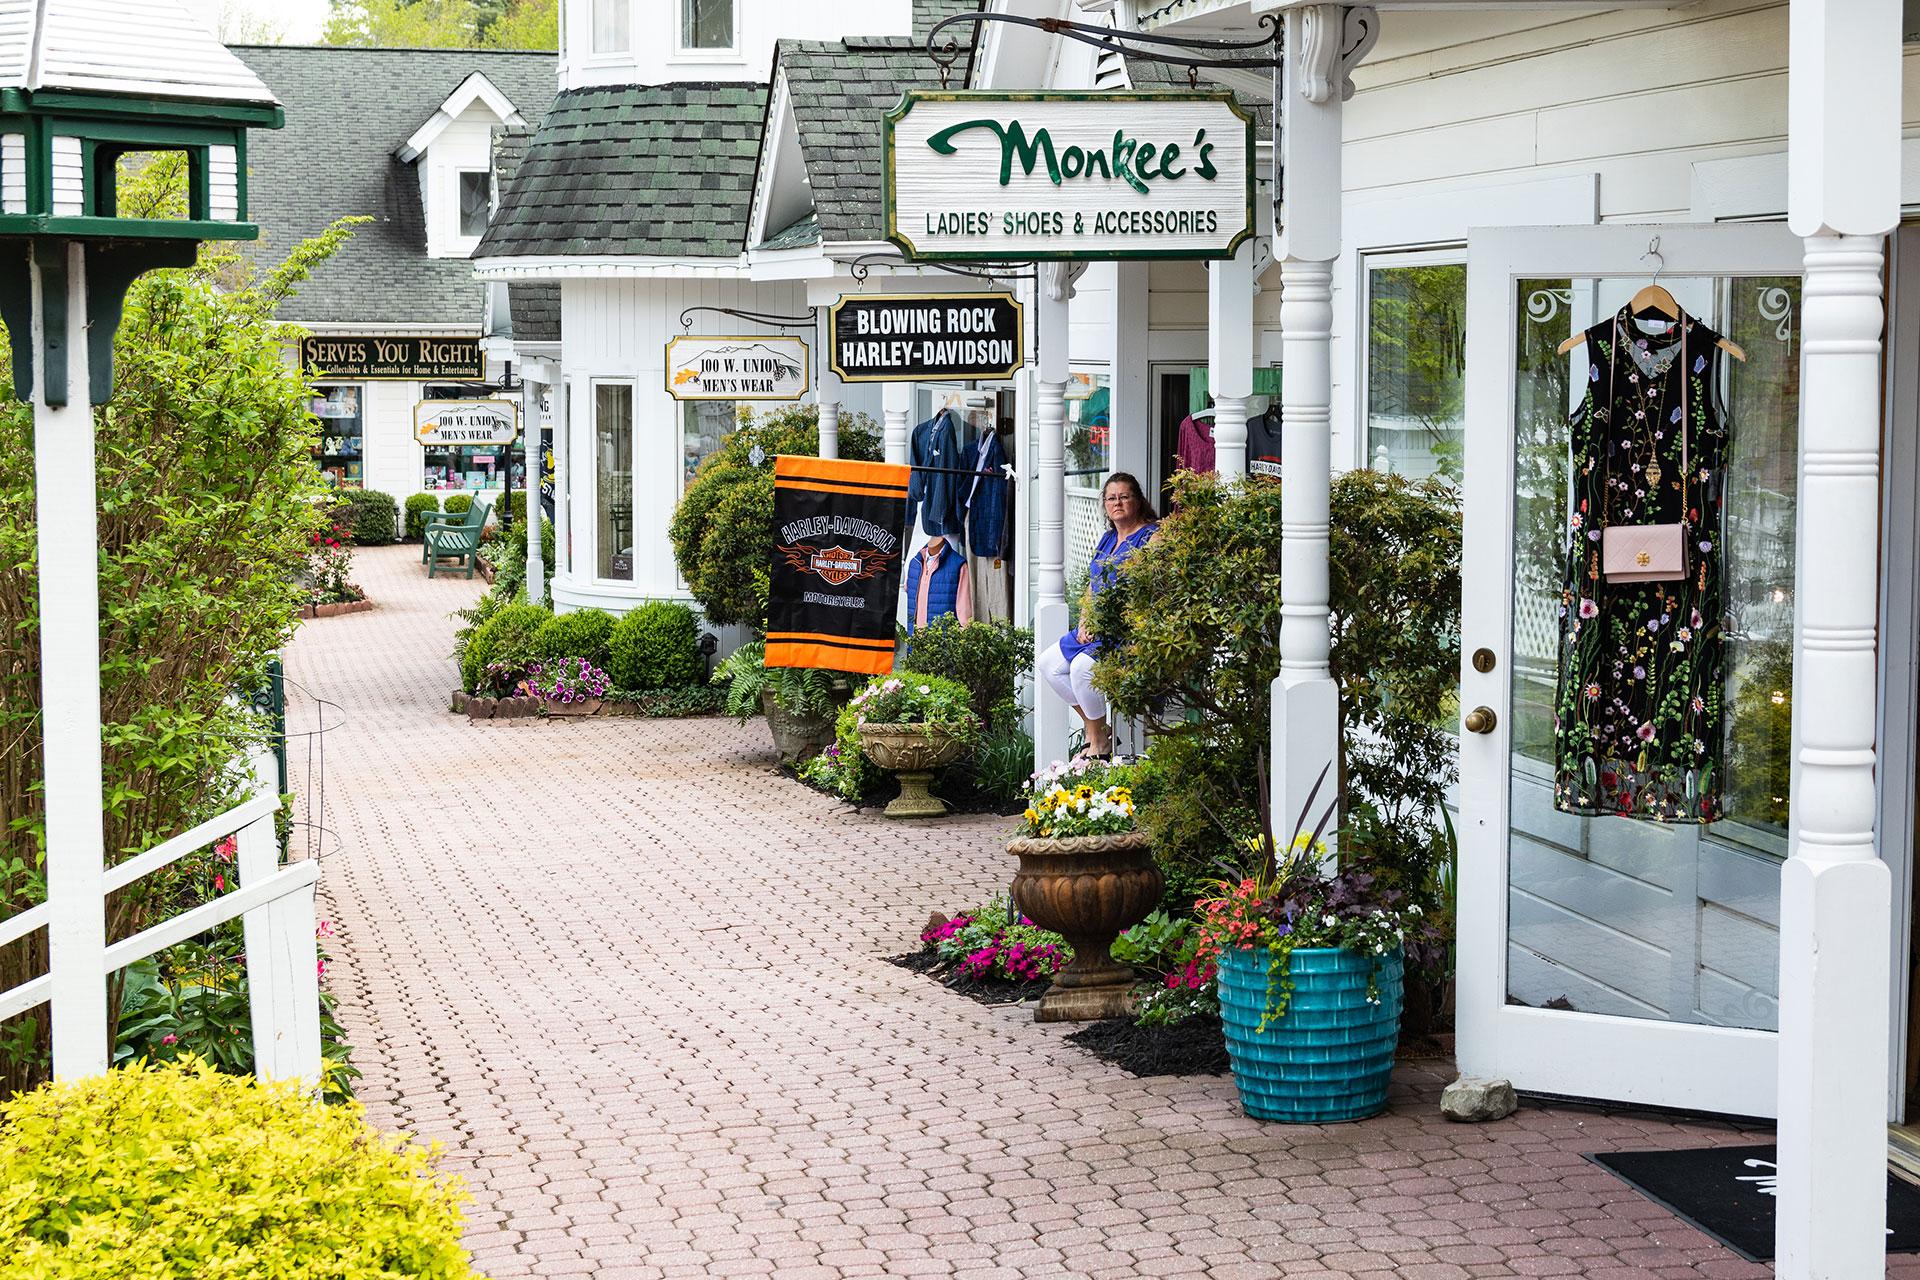 Blowing Rock NC; Courtesy of MilesbeforeIsleep/Shutterstock.com